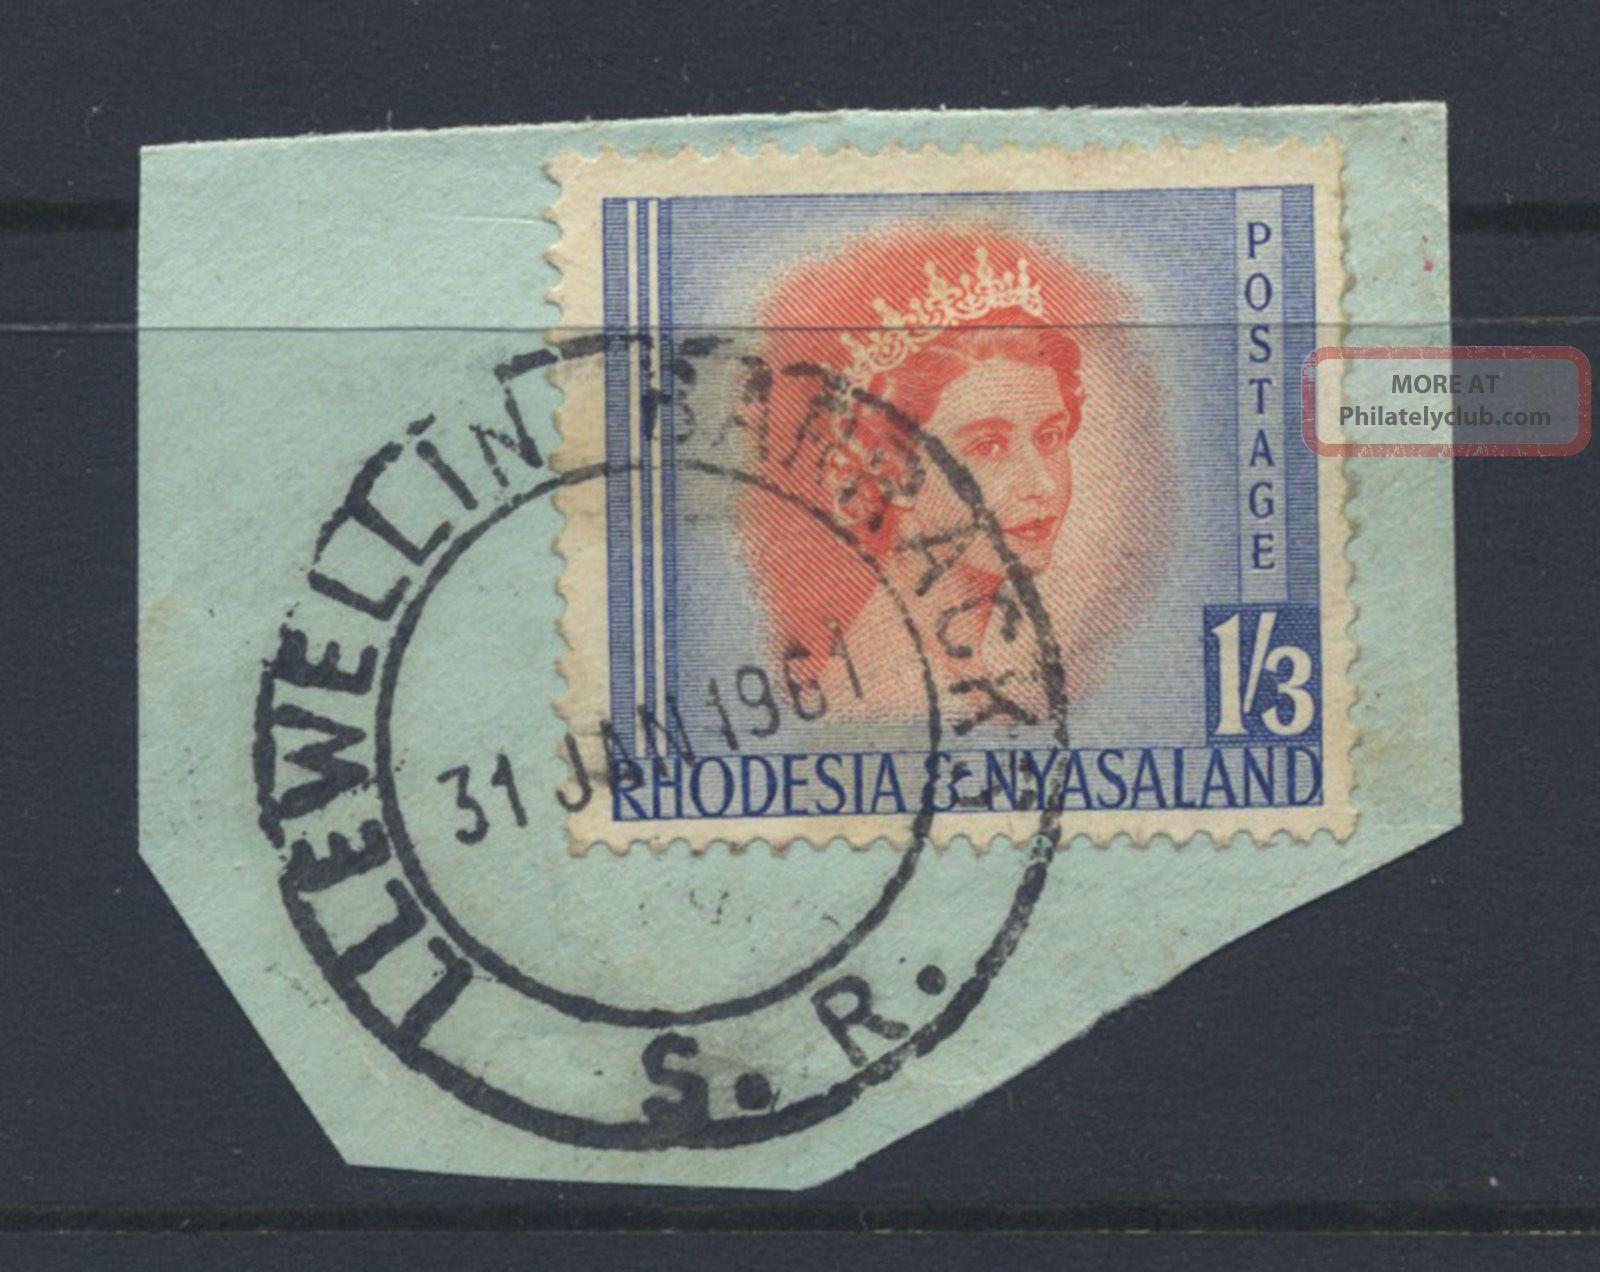 Rhodesia - Strike  Llewellin Barracks  Price. Africa photo